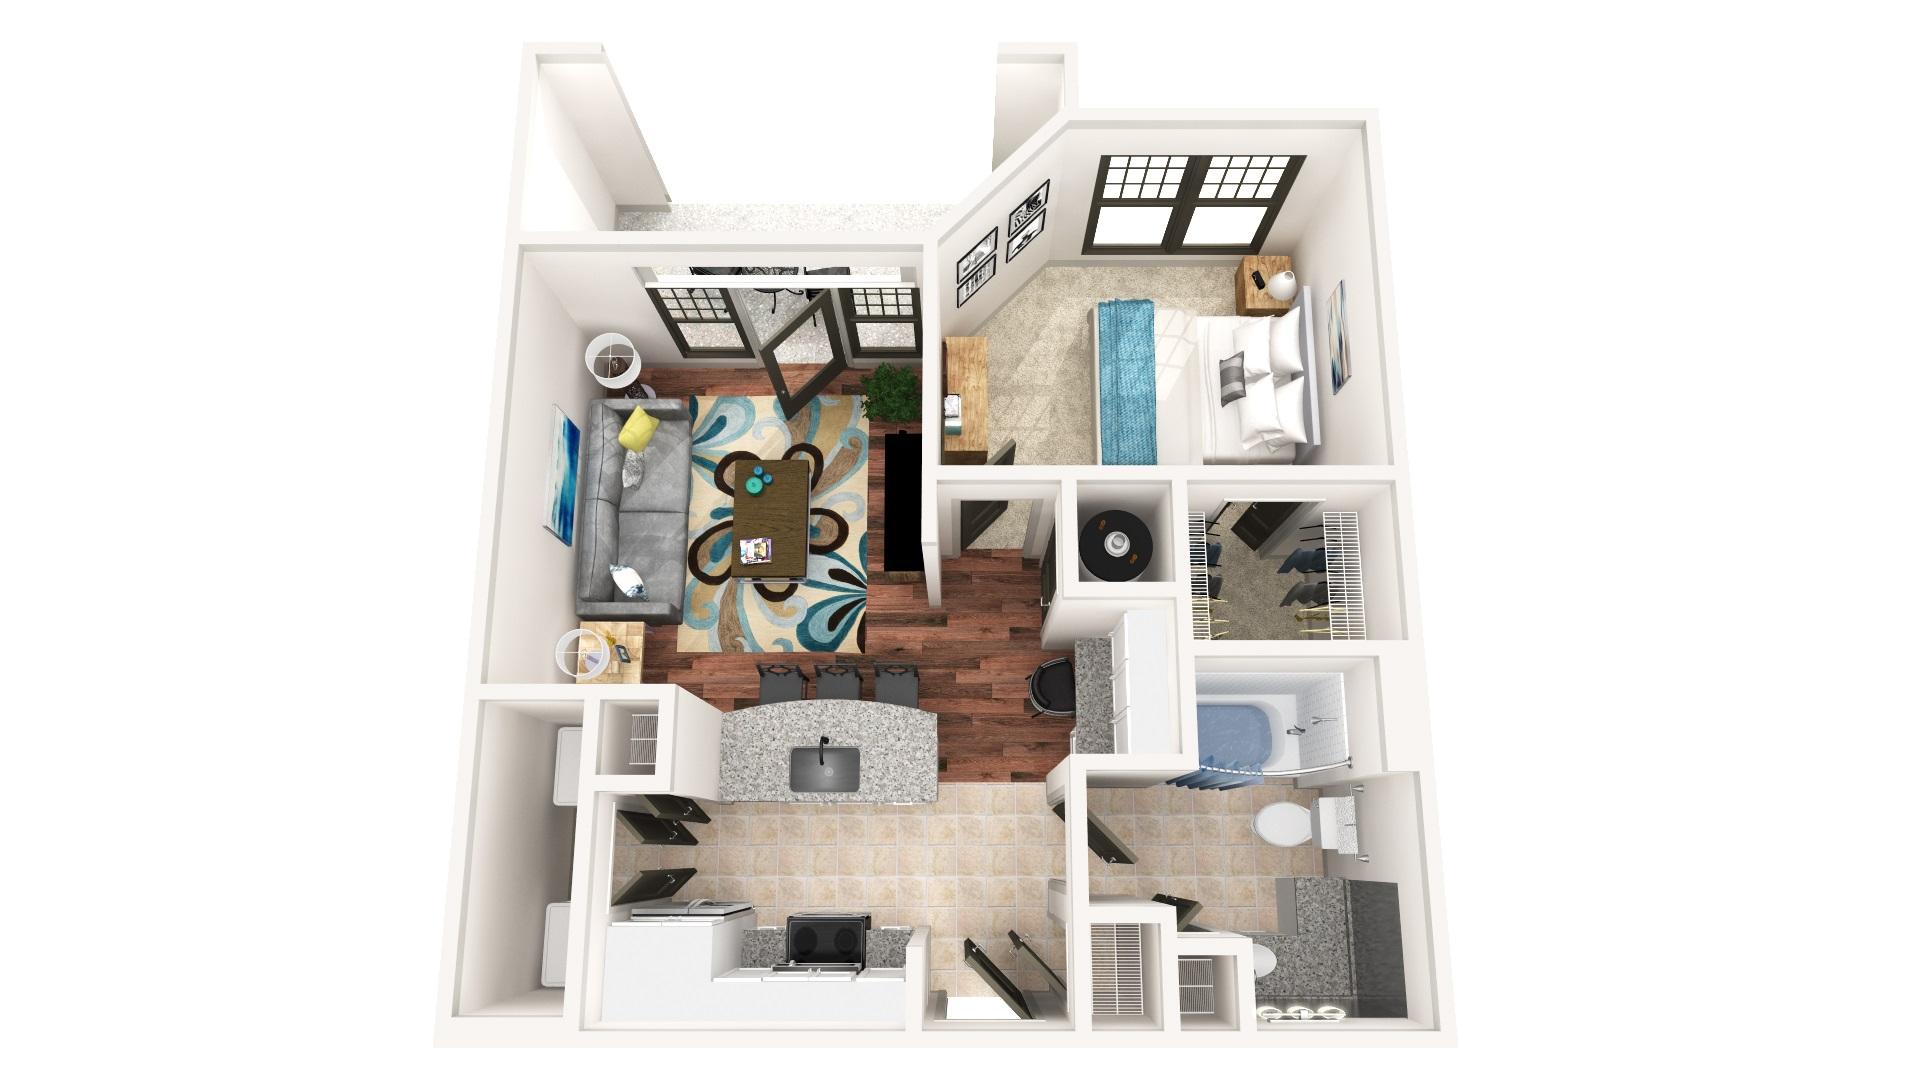 Floorplan - A-7C image